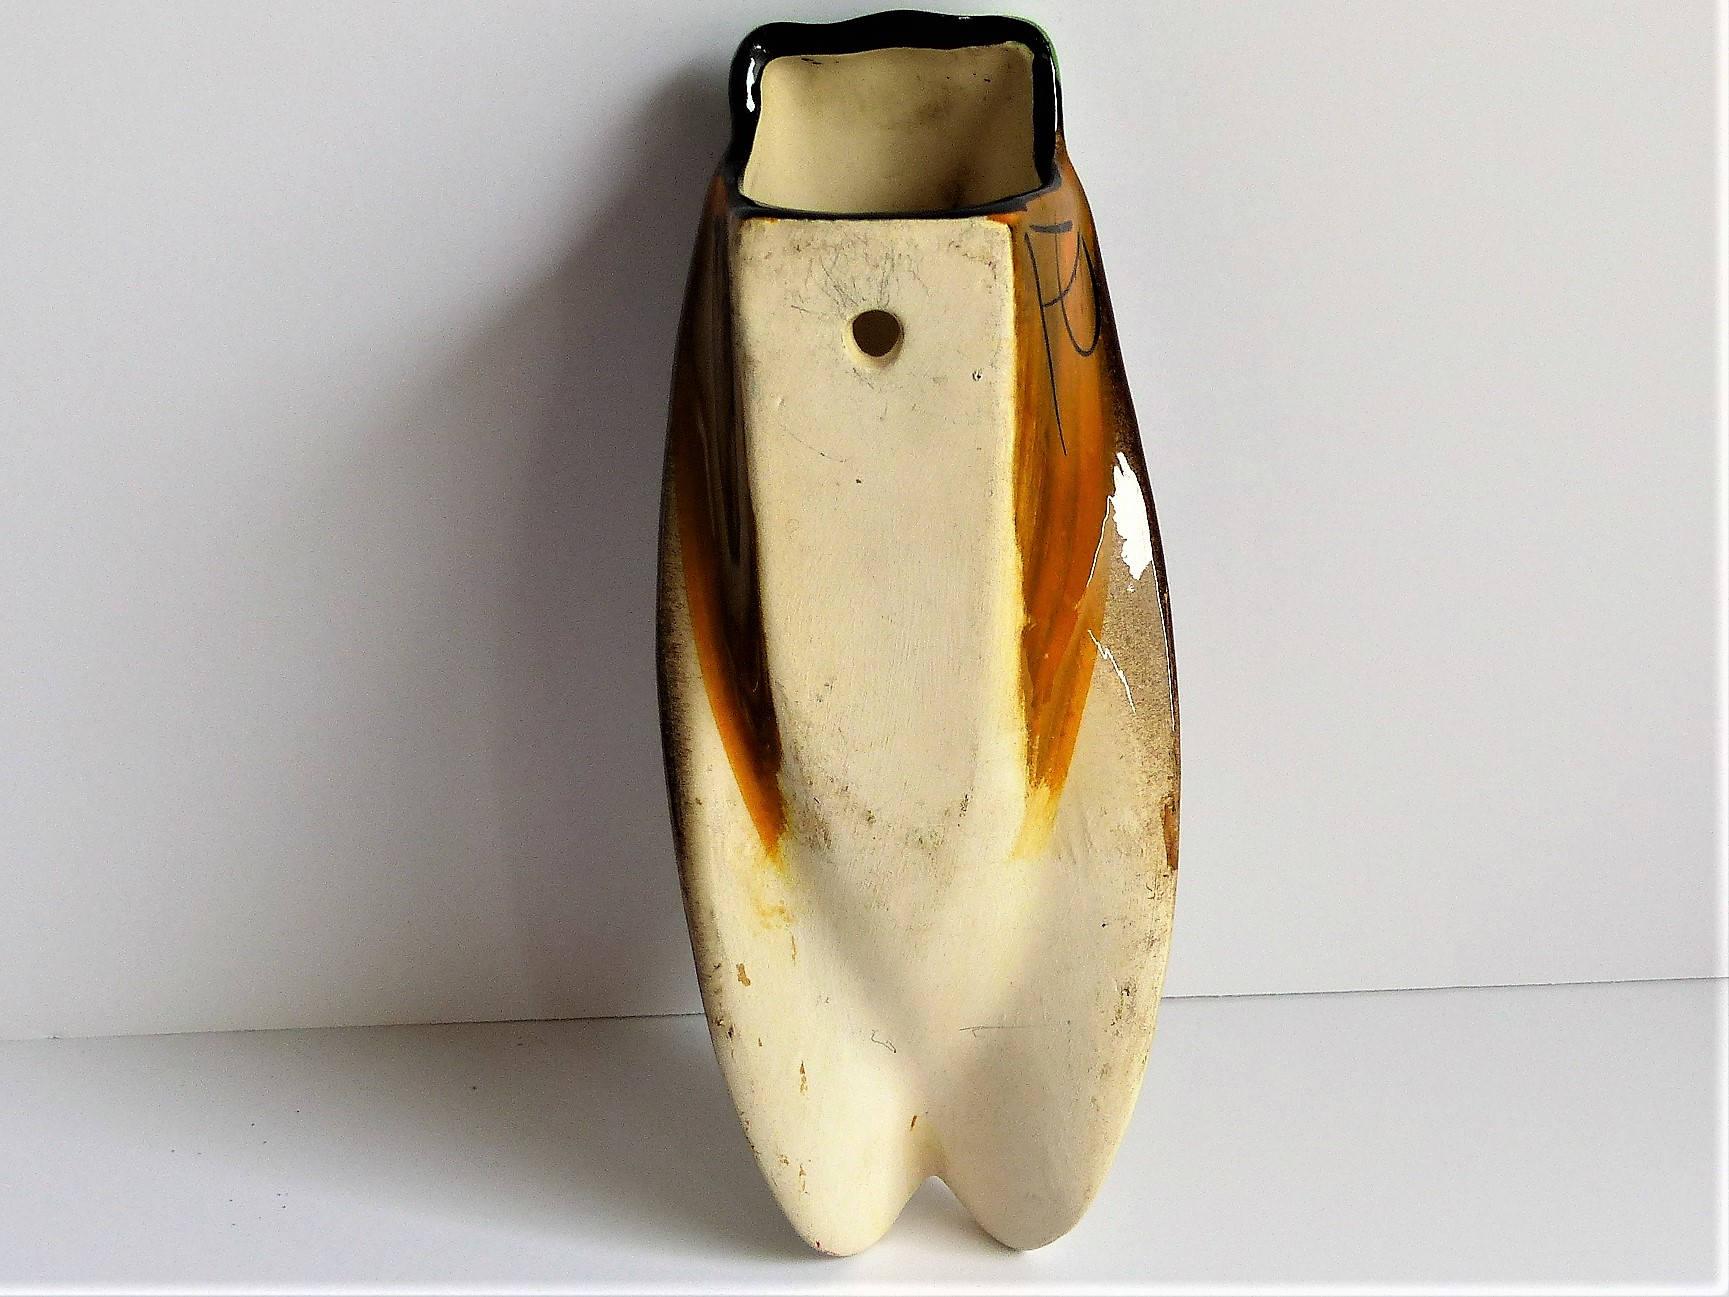 Famous Vase Wall Decor Vignette - The Wall Art Decorations ...